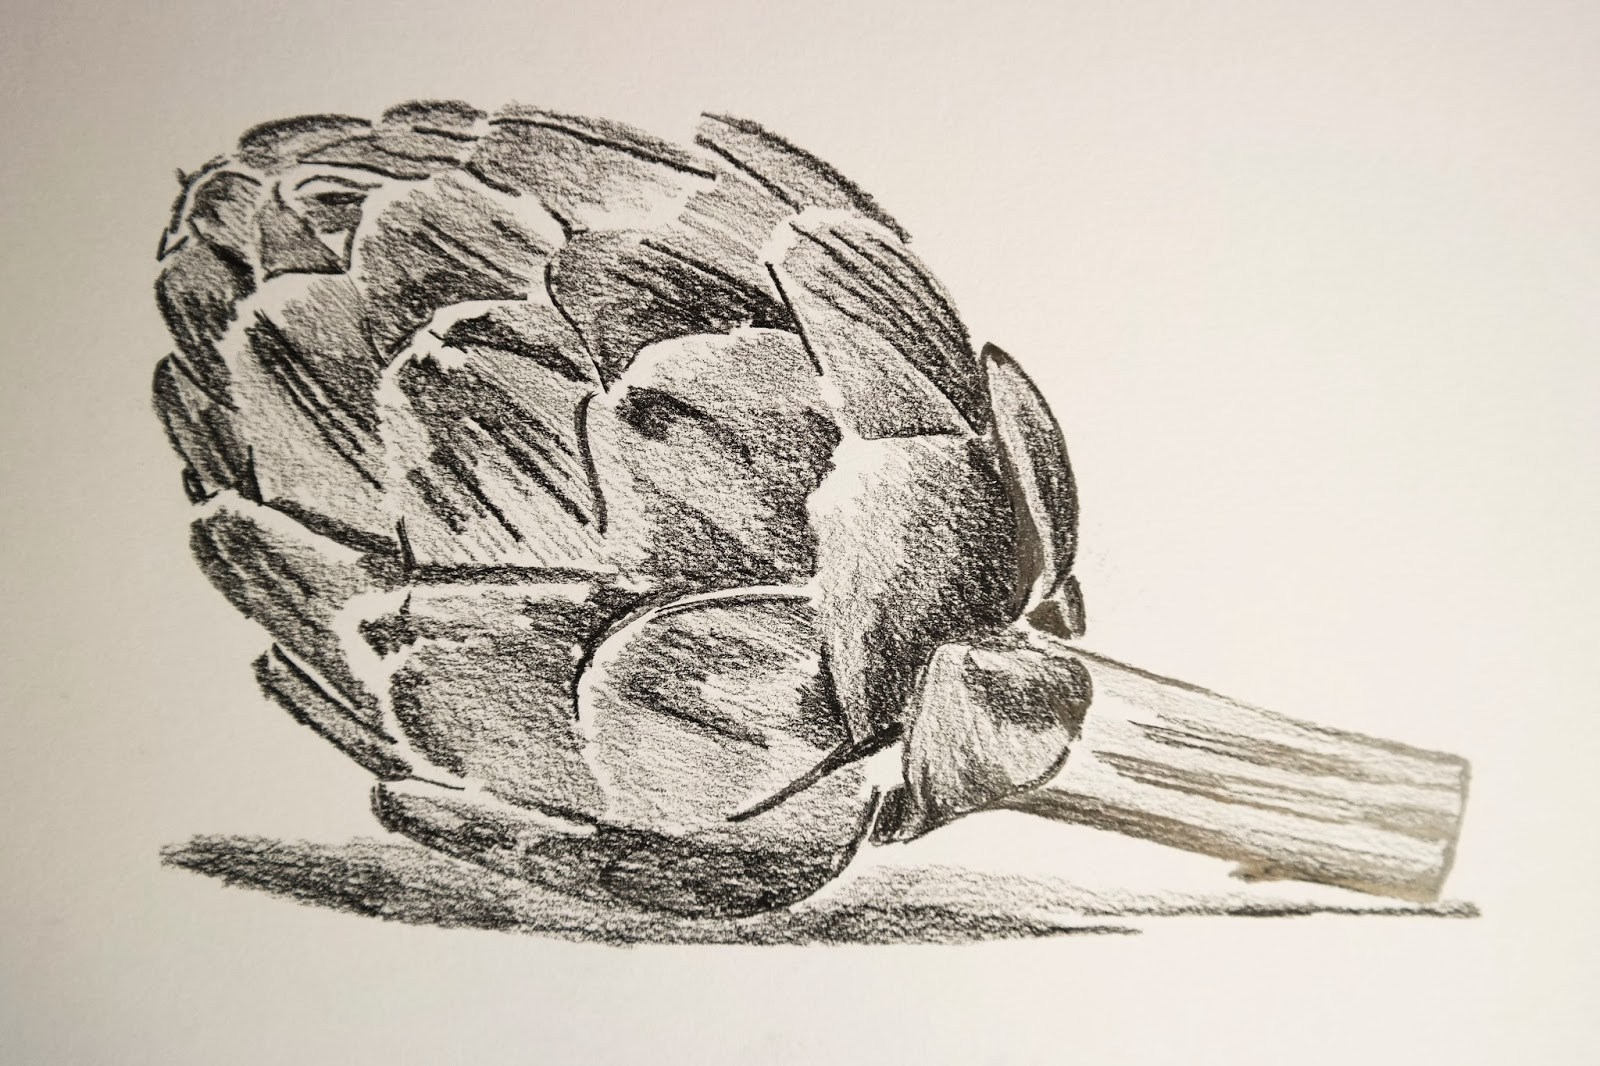 Line Drawing Natural Forms : Tonal study ocadrawing jfm